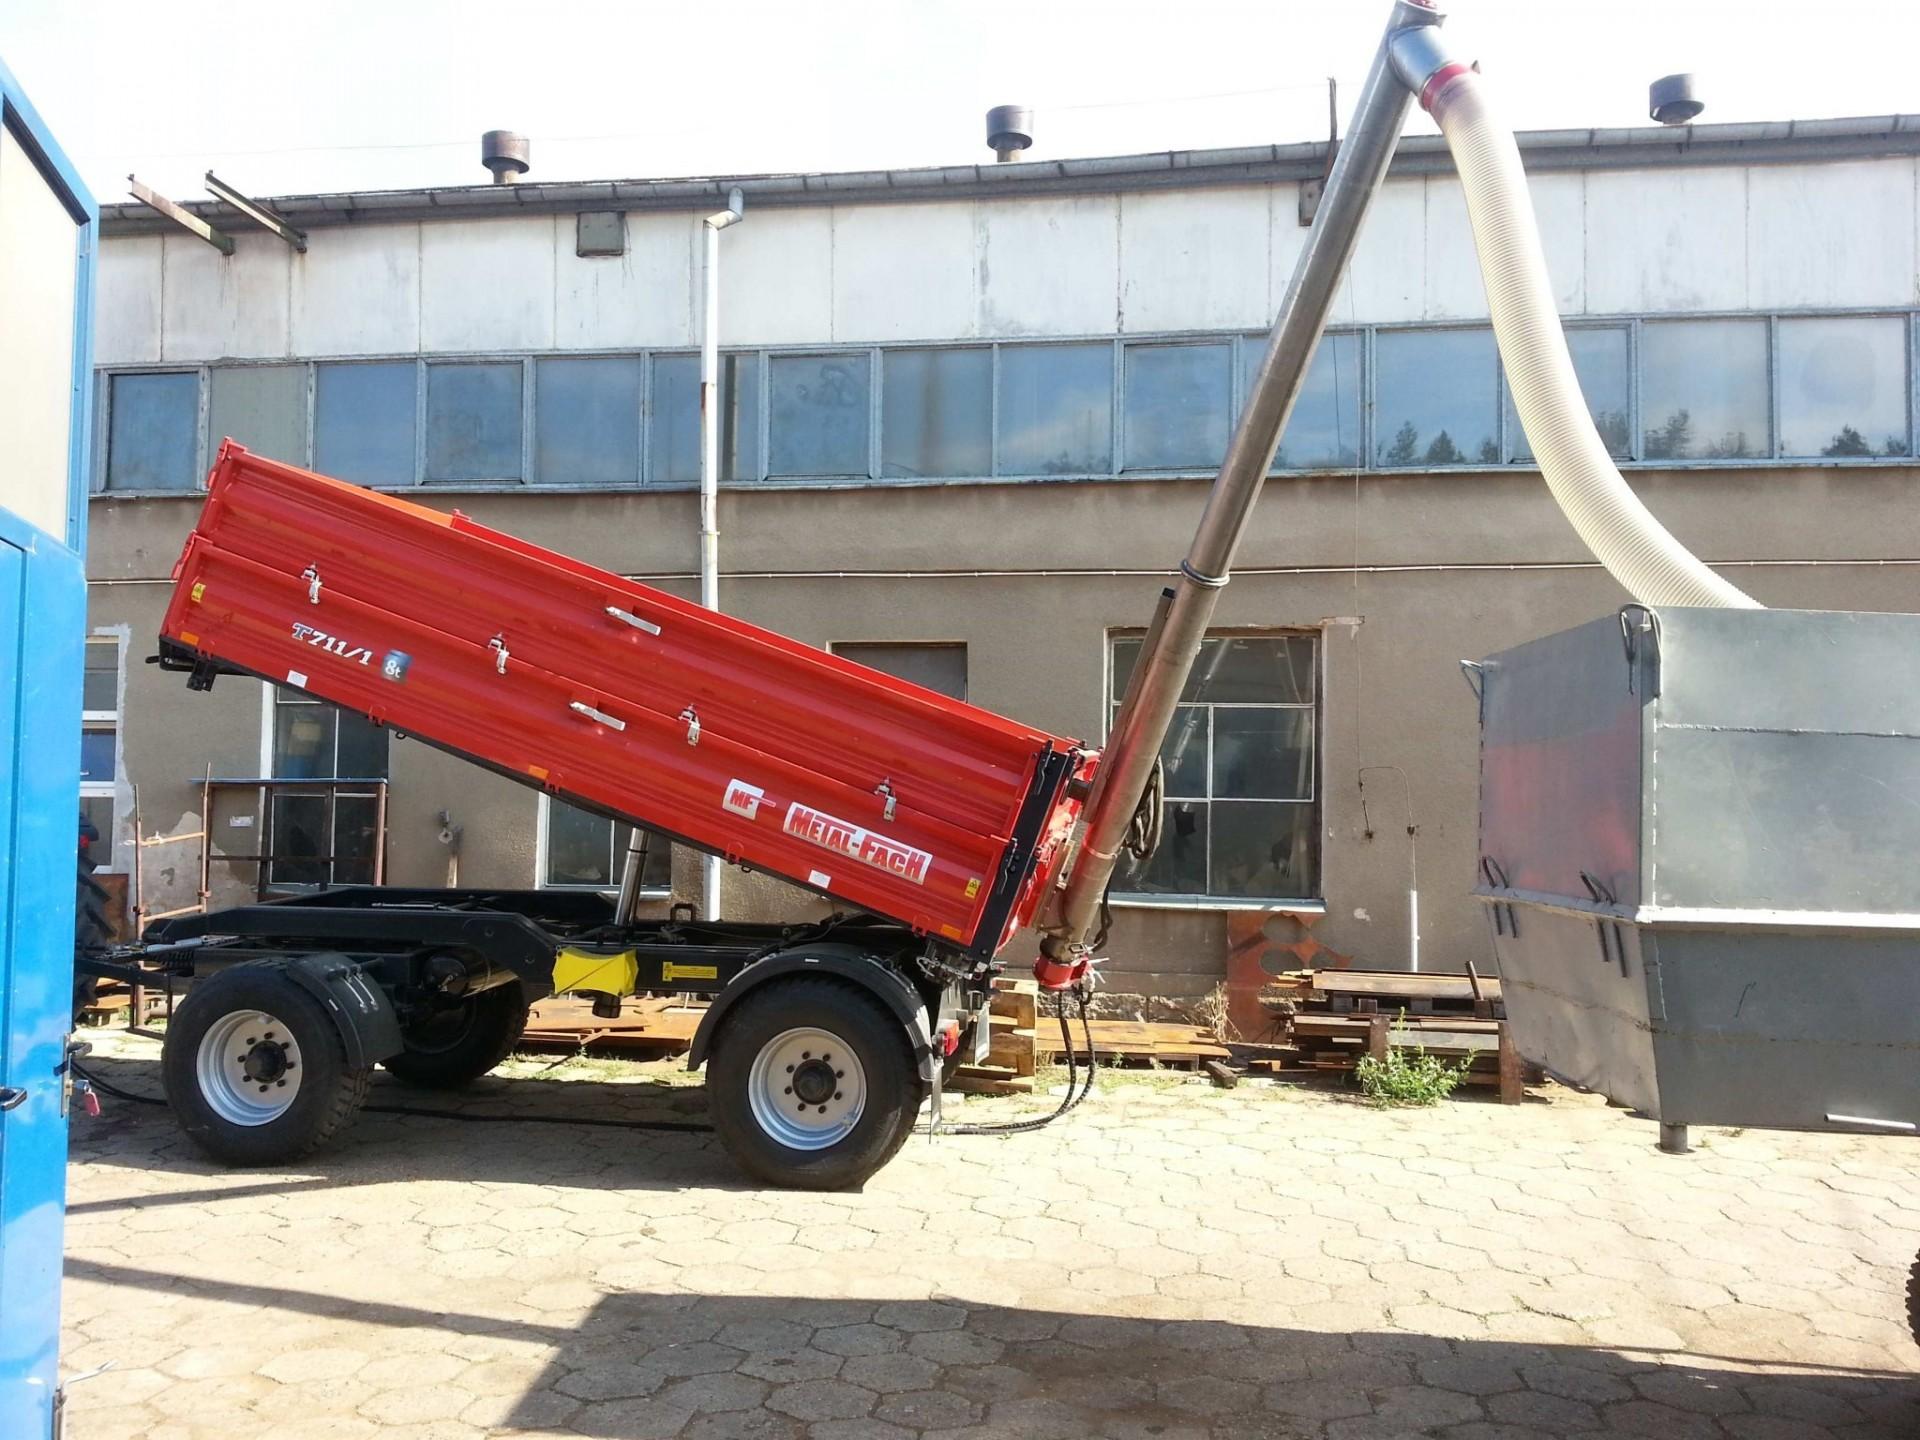 POM Augustow Sinfin para remolque 5,4m largo y 40-60 ton/hora - 6